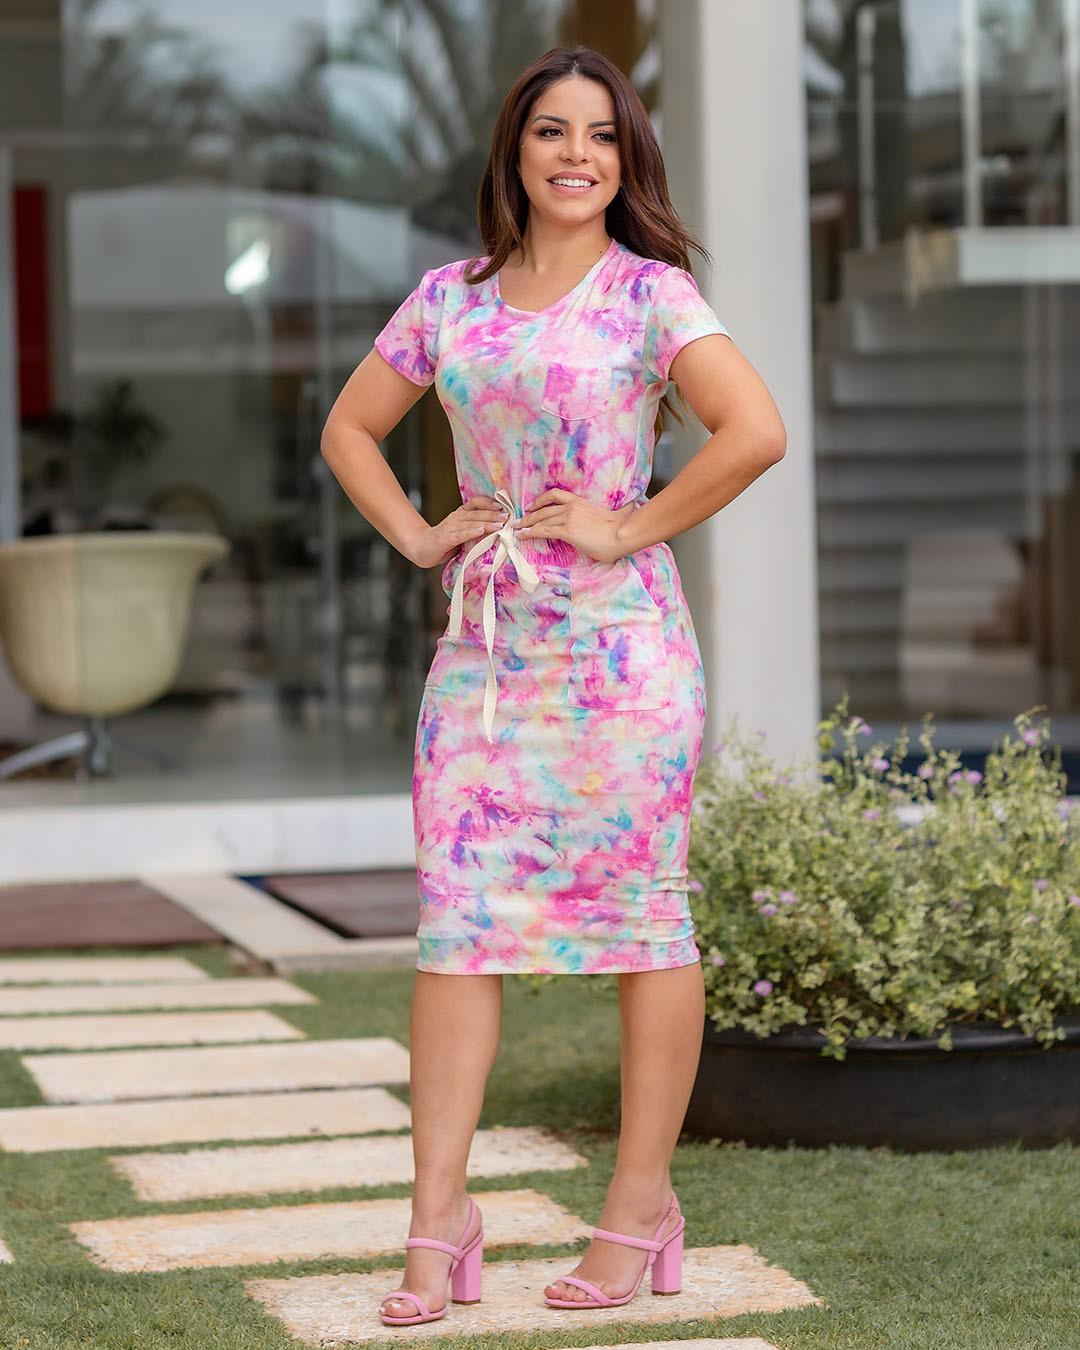 Conjunto Feminino Tubinho Tie Dye Az Irmãs Paola Santana